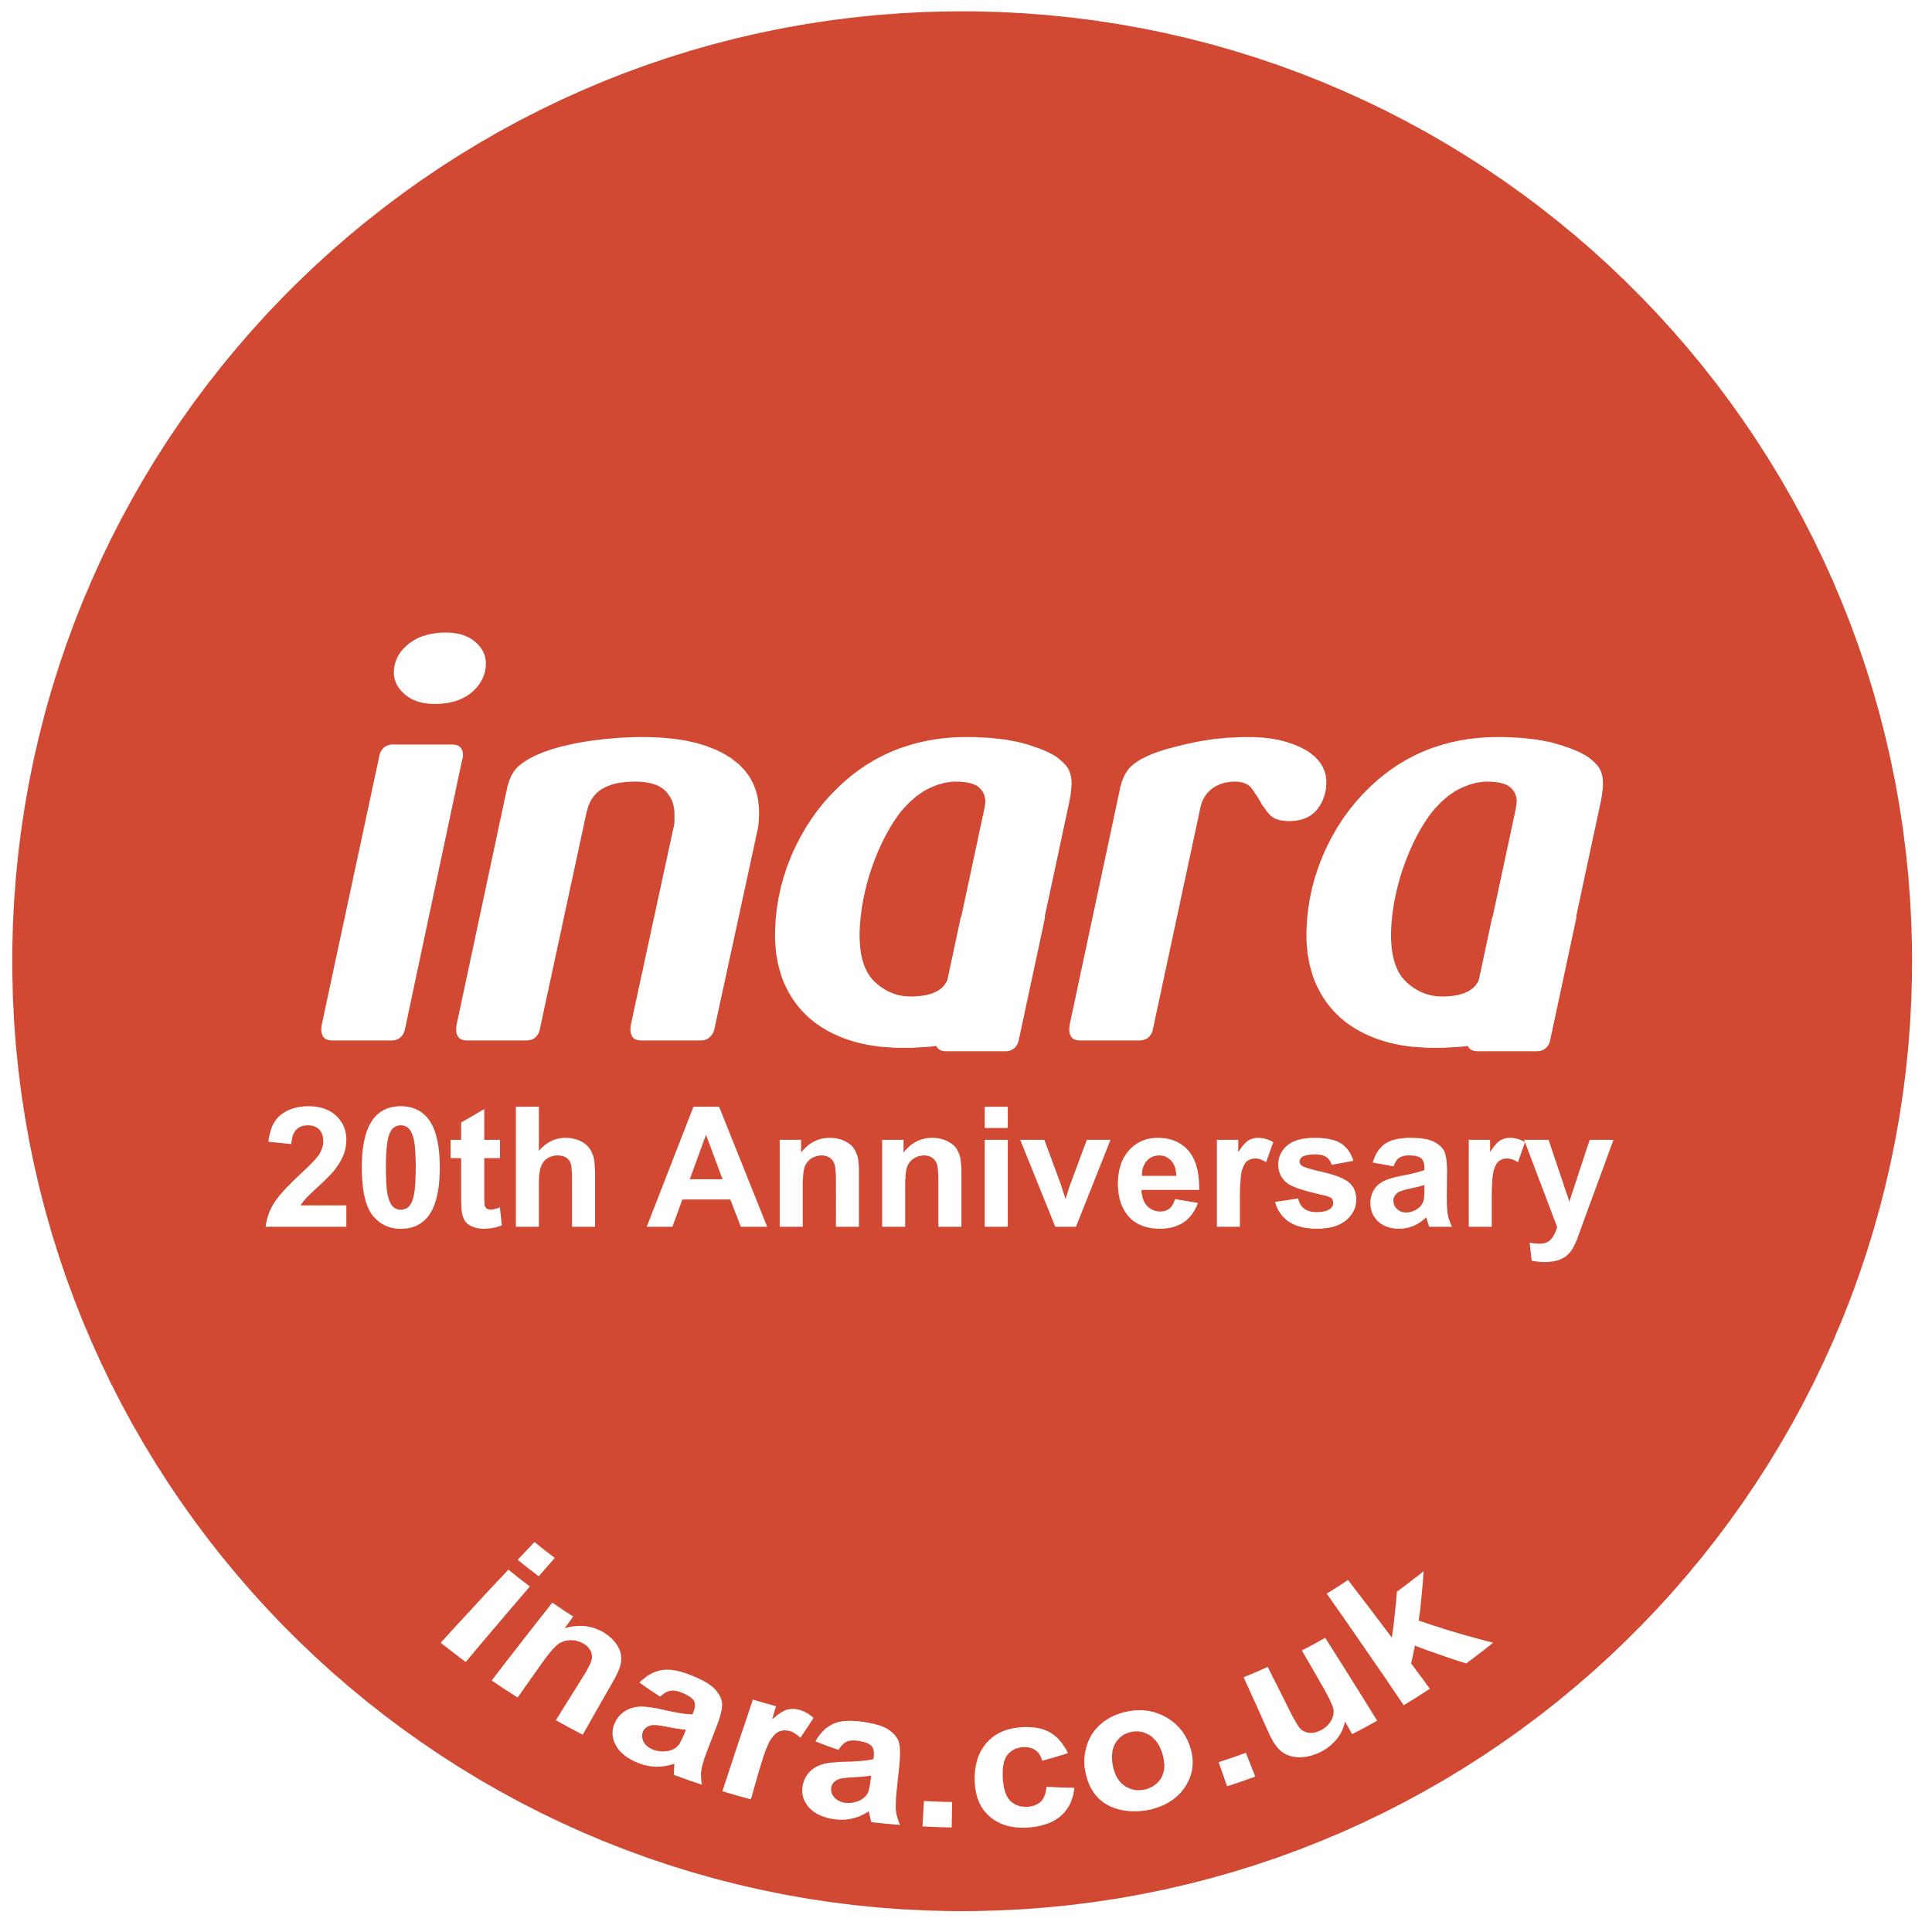 Inara Transfers Ltd - London, London SE1 6EB - 020 7252 5950 | ShowMeLocal.com